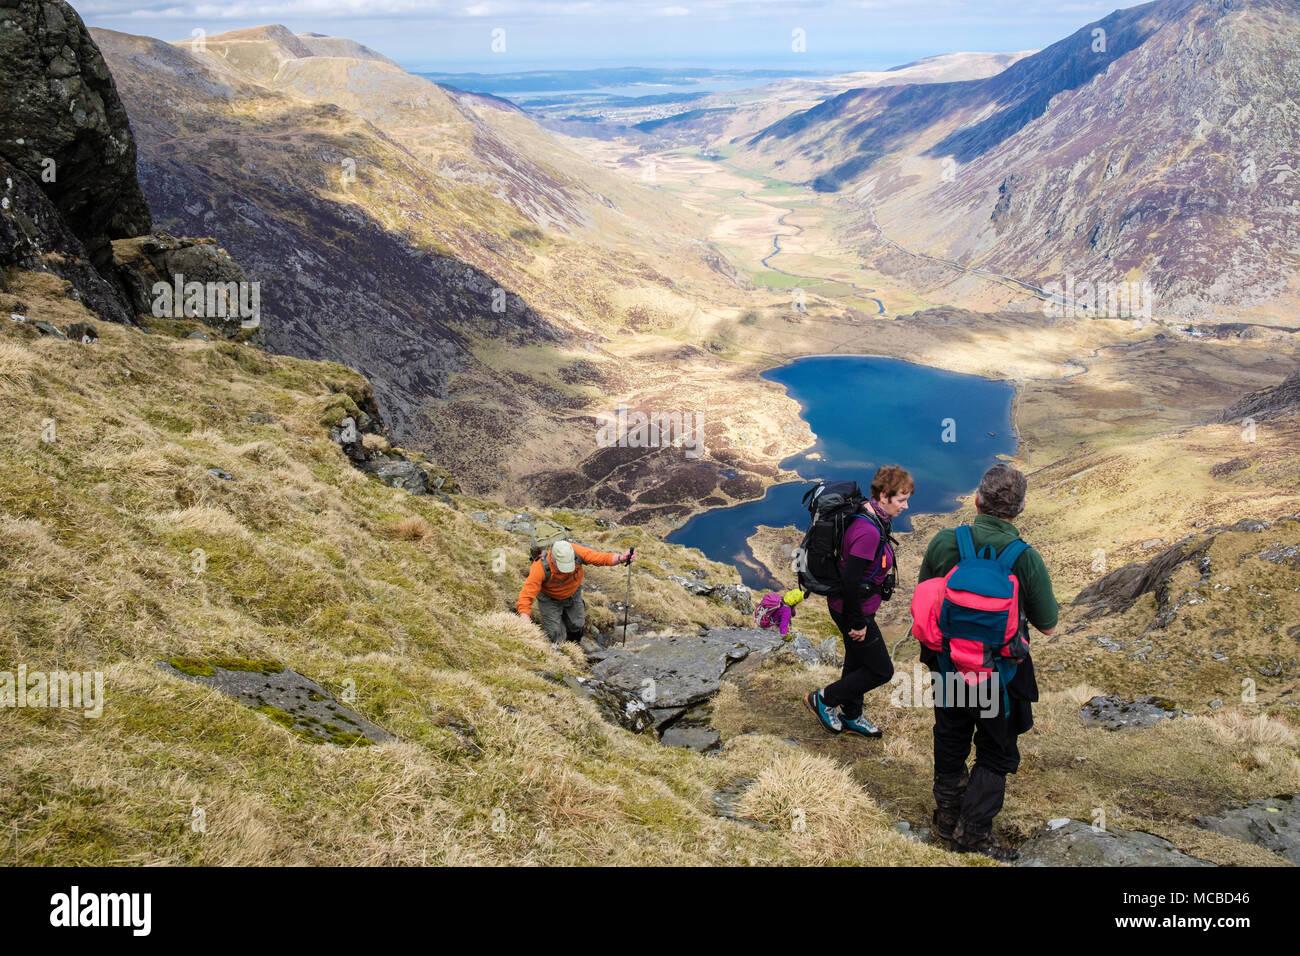 Hikers hiking up Seniors Ridge above Cwm Idwal in mountains of Snowdonia National Park. Ogwen, Wales, UK, Britain - Stock Image